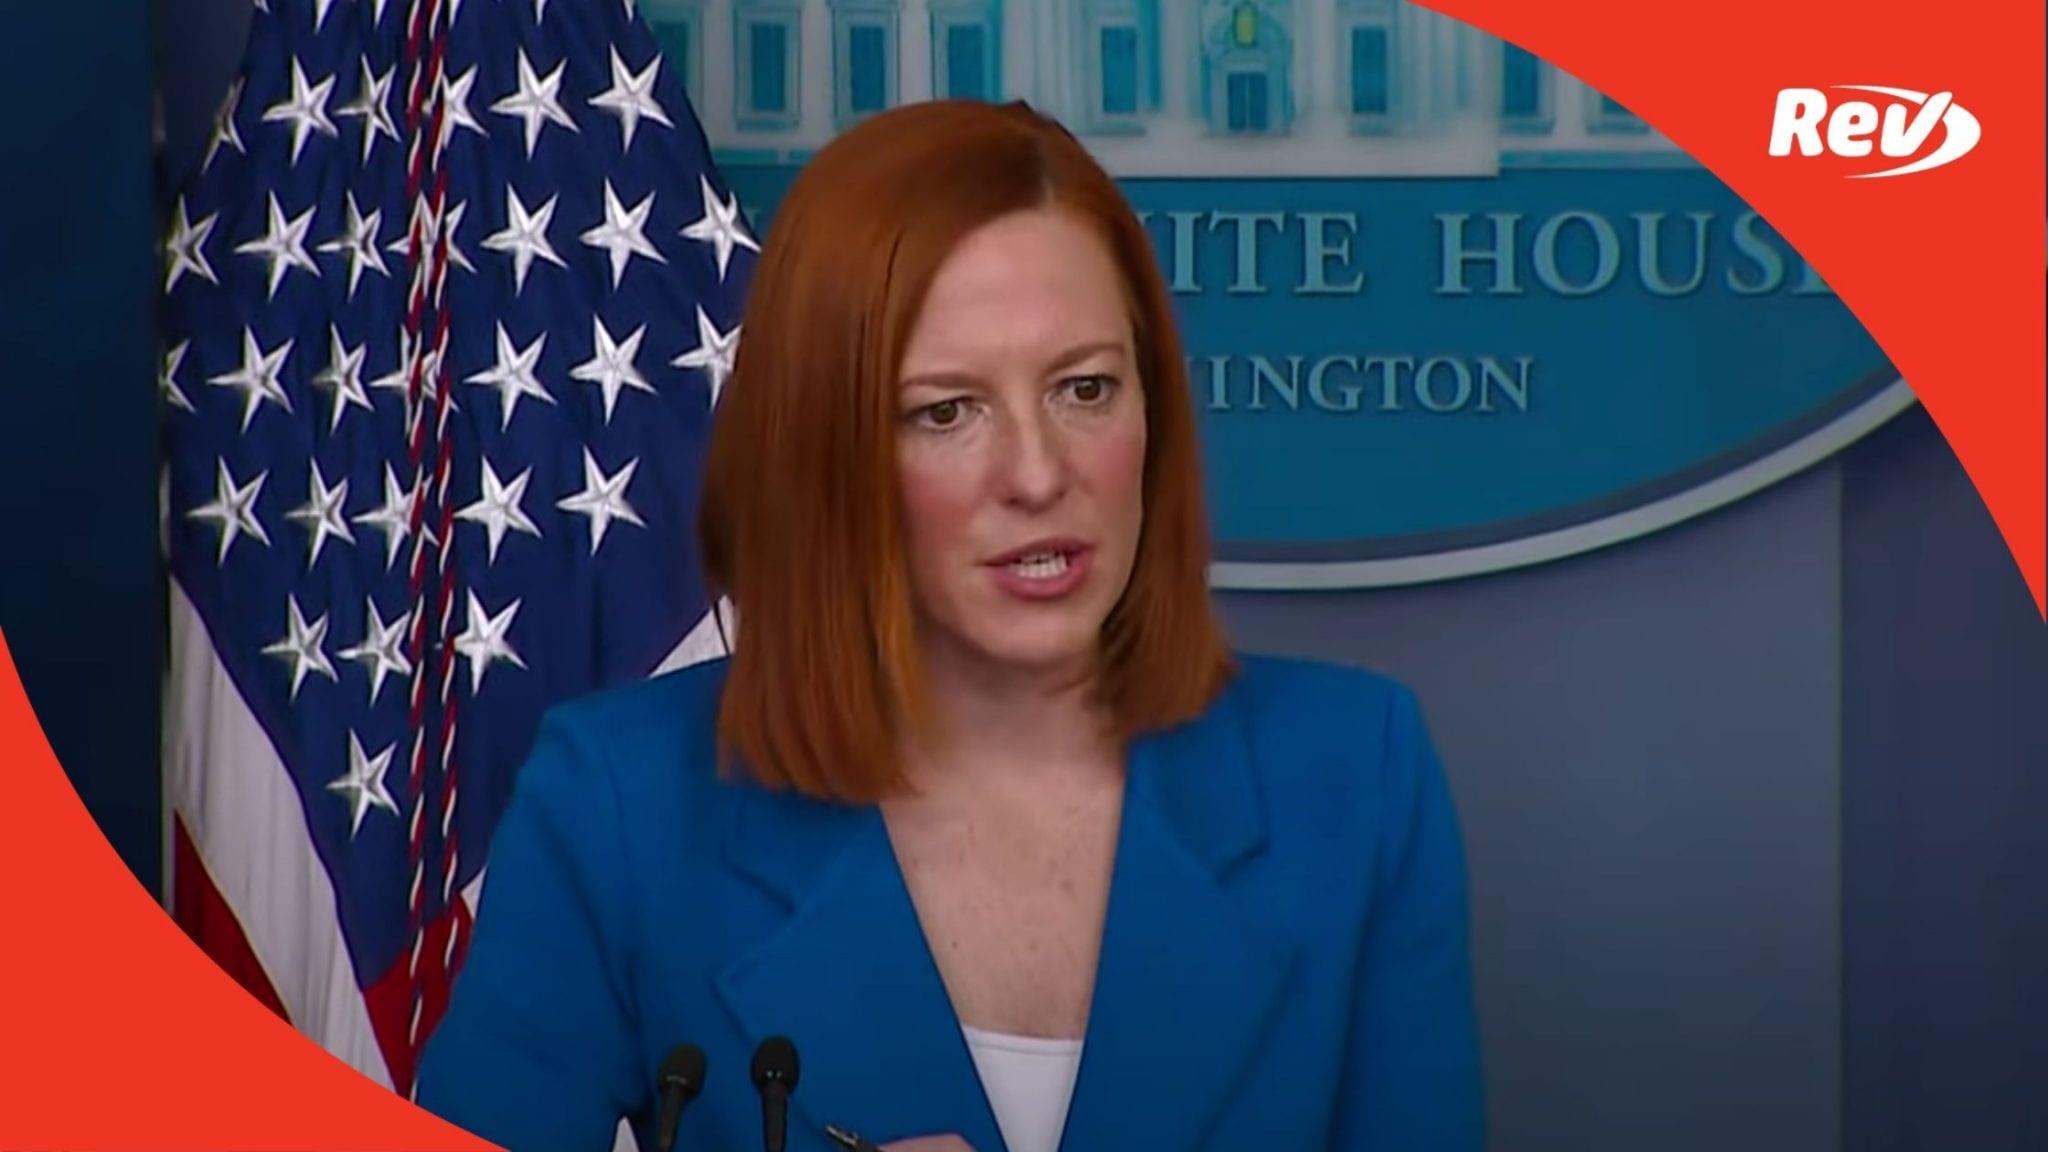 Press Secretary Jen Psaki White House Press Conference Transcript February 2